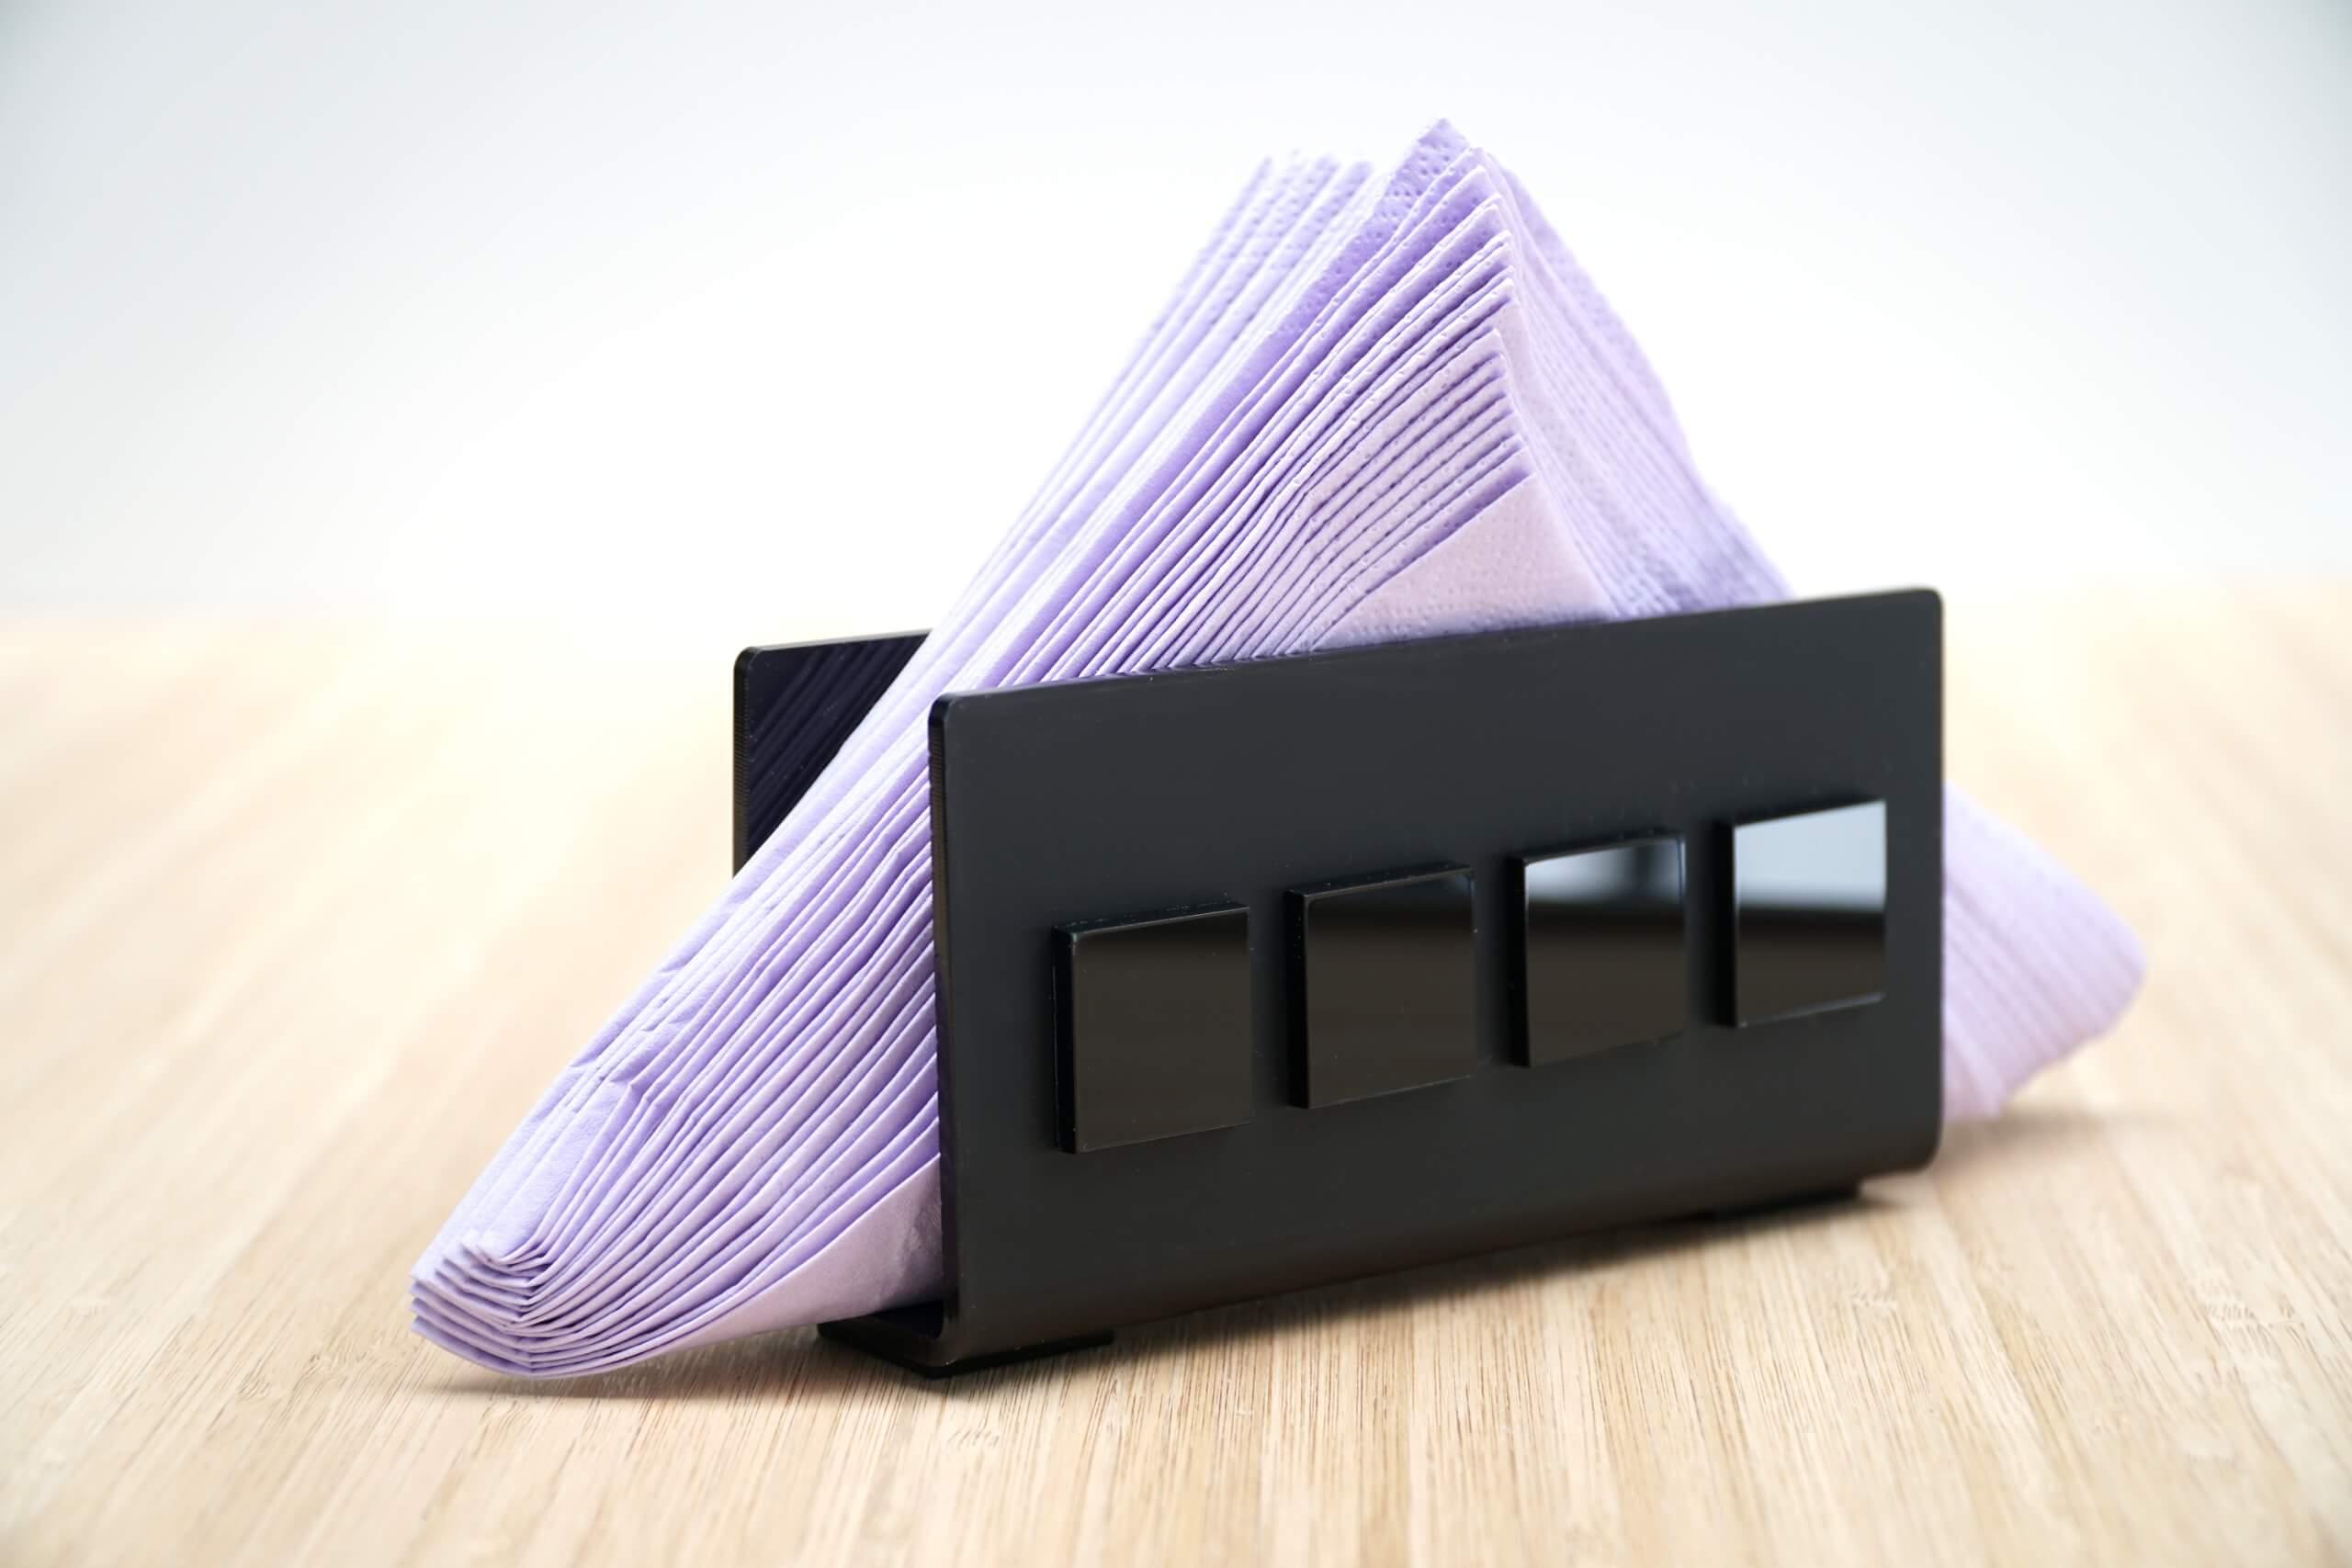 serveteliu-laikiklis-napkins.jpg